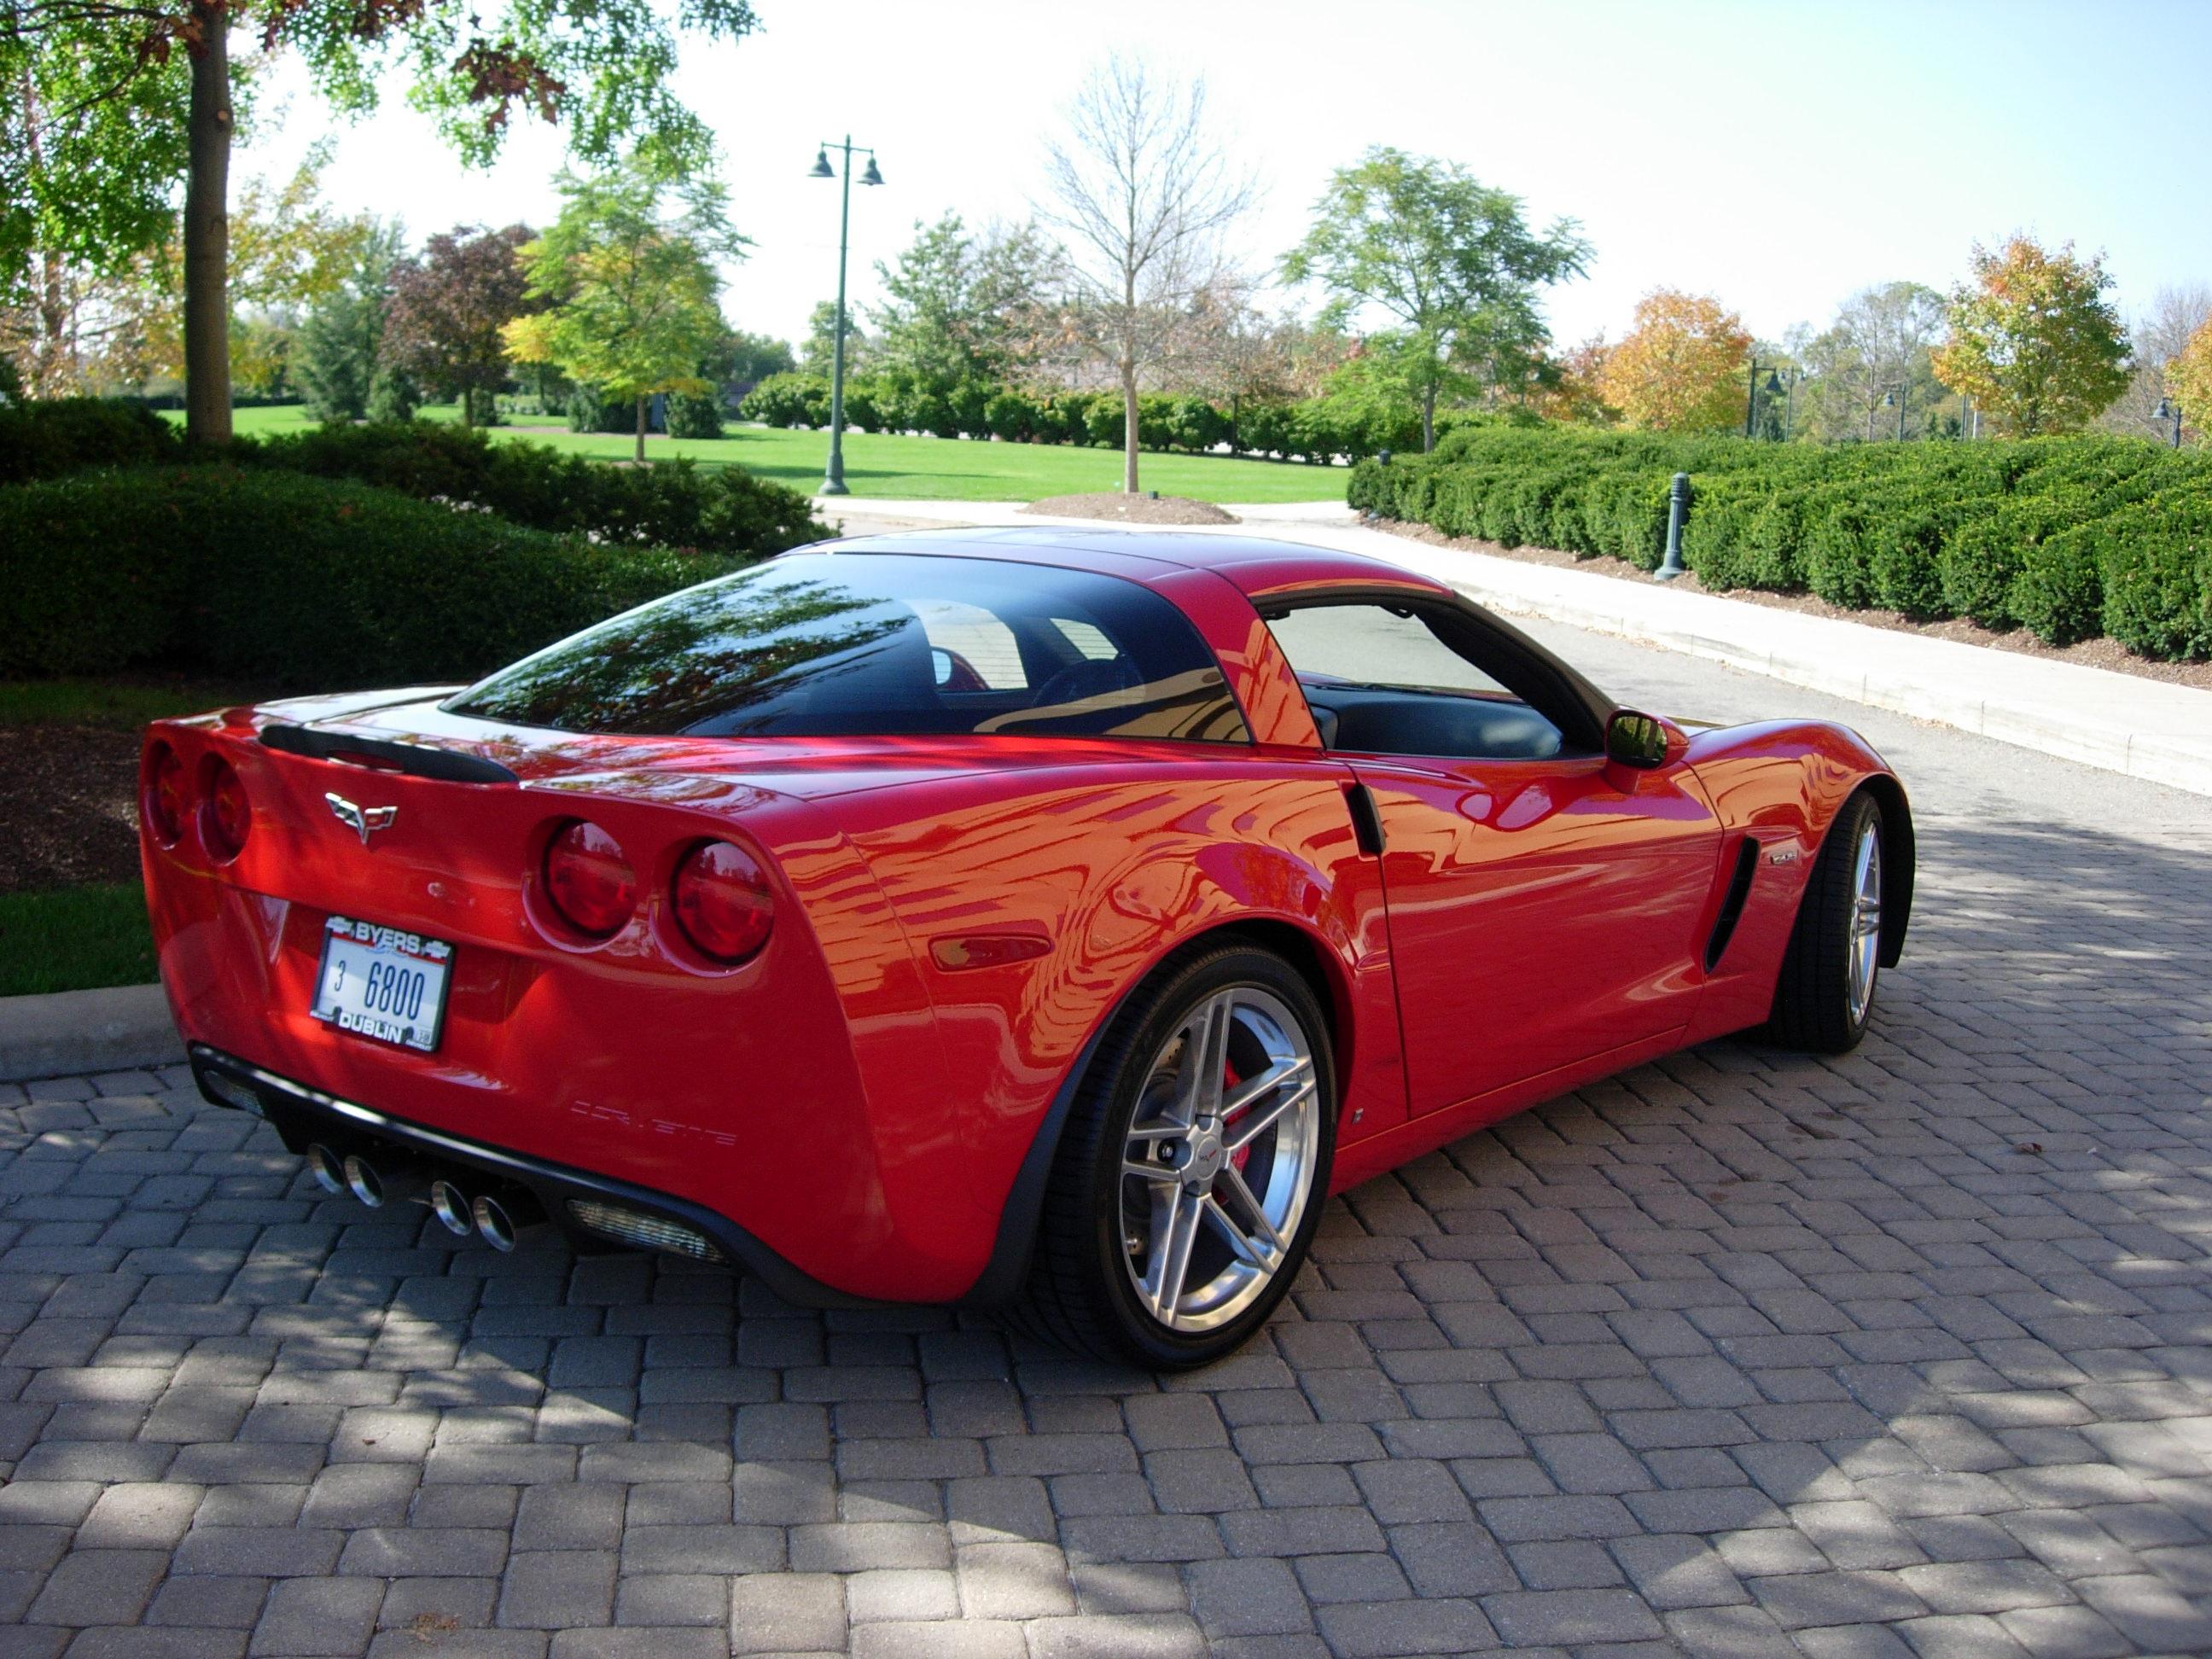 2007 zo6 chevrolet corvette supercar muscle v wallpaper 2592x1944 176344 wallpaperup. Black Bedroom Furniture Sets. Home Design Ideas